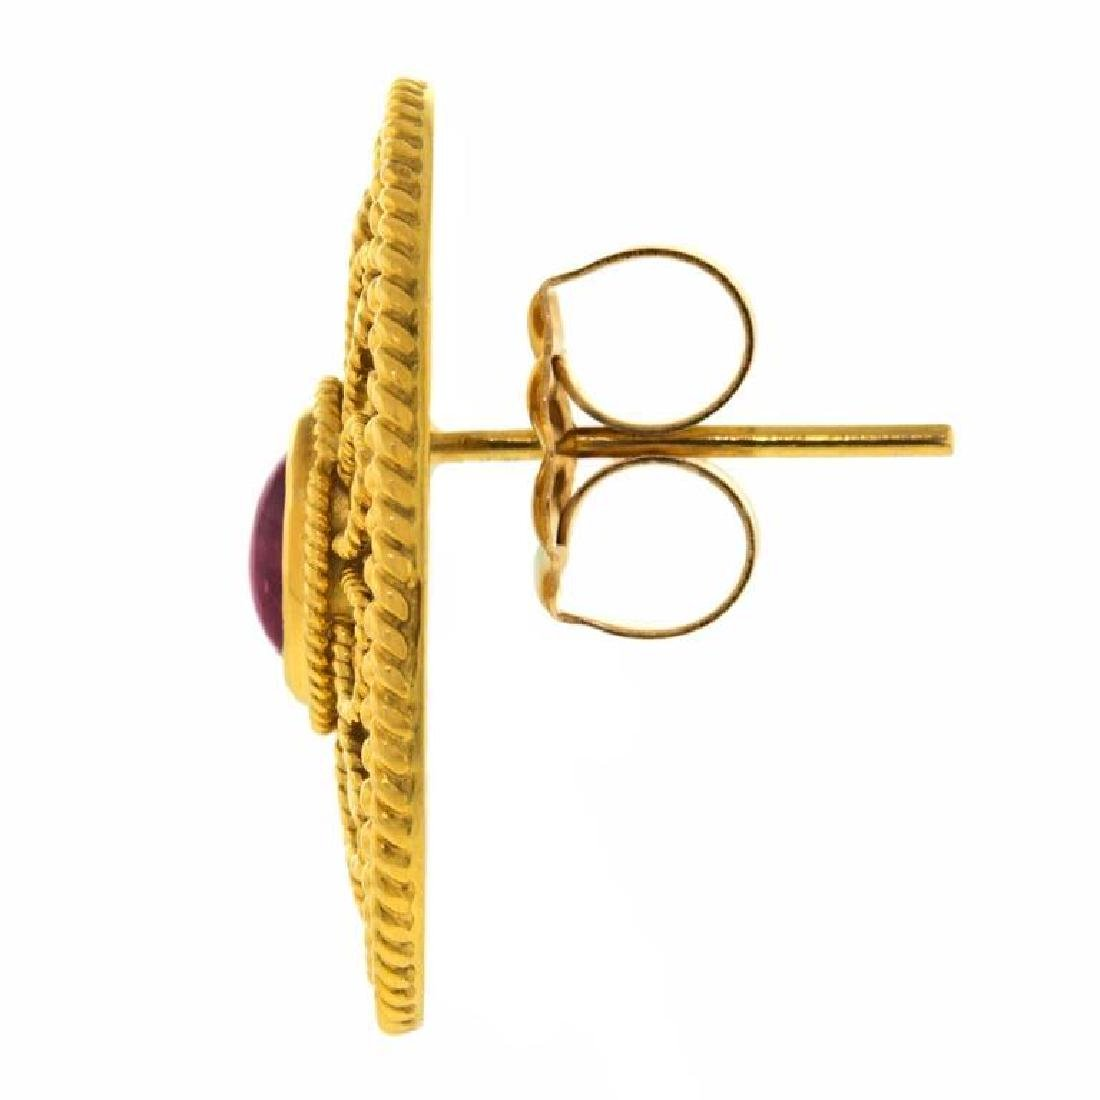 Archaic Motif 18k and Ruby Earrings - 3